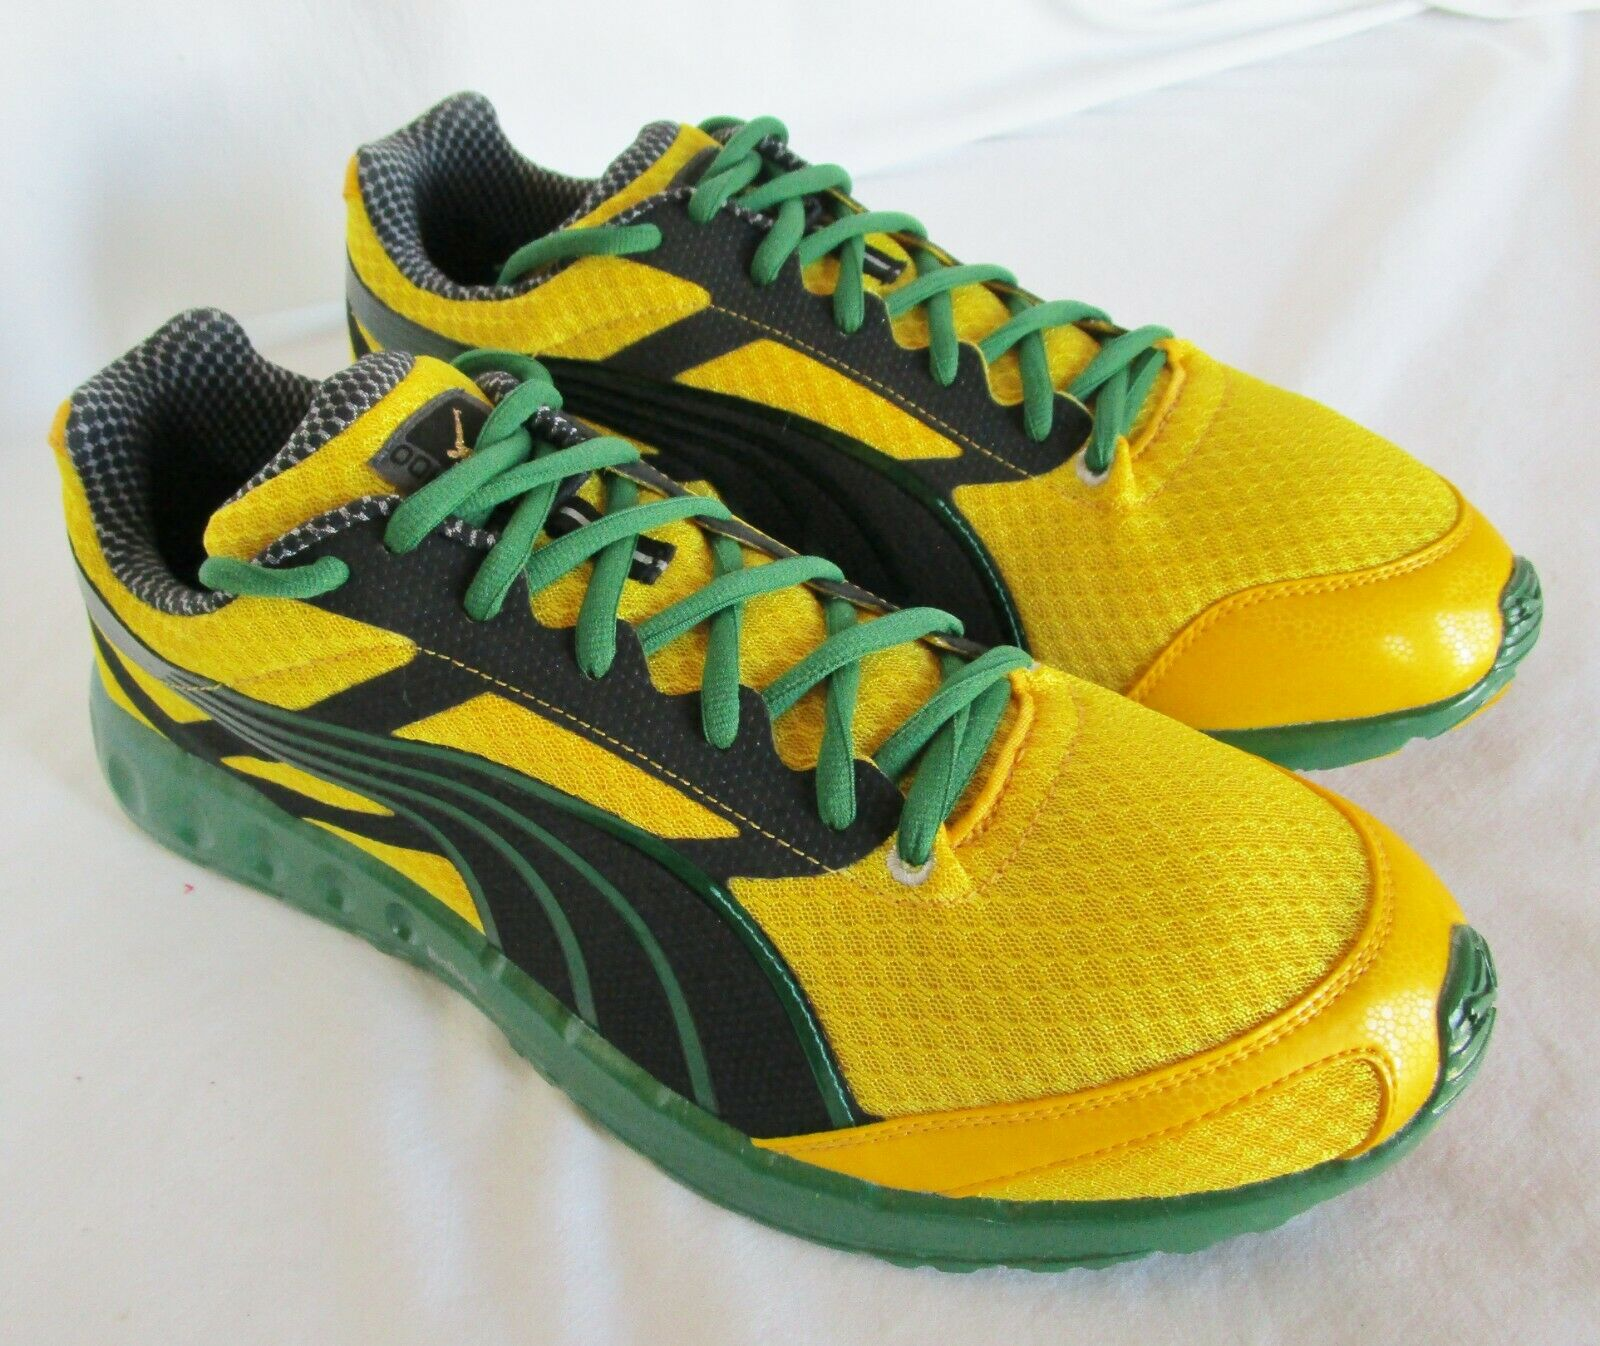 Puma Usain Bolt BioRide Lifestyle Sz 11.5 Running shoes